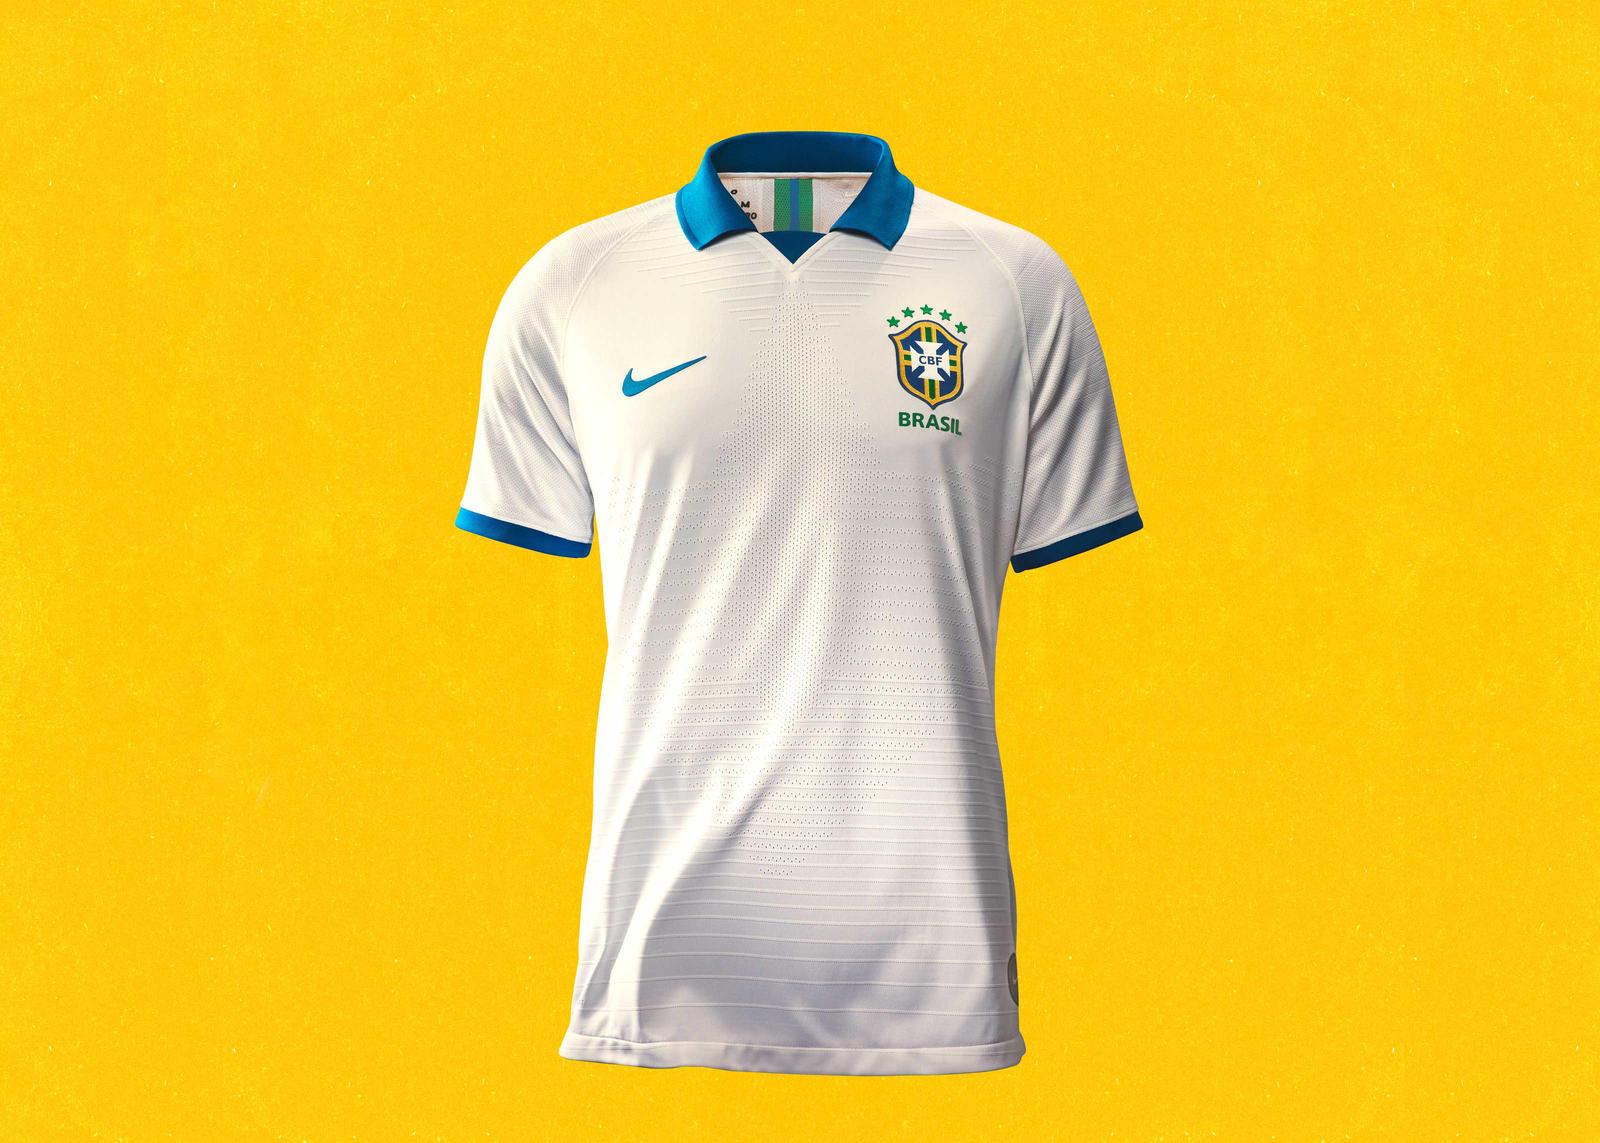 nike-brasil-copa-america-100th-anniversary-jersey-1_rectangle_1600